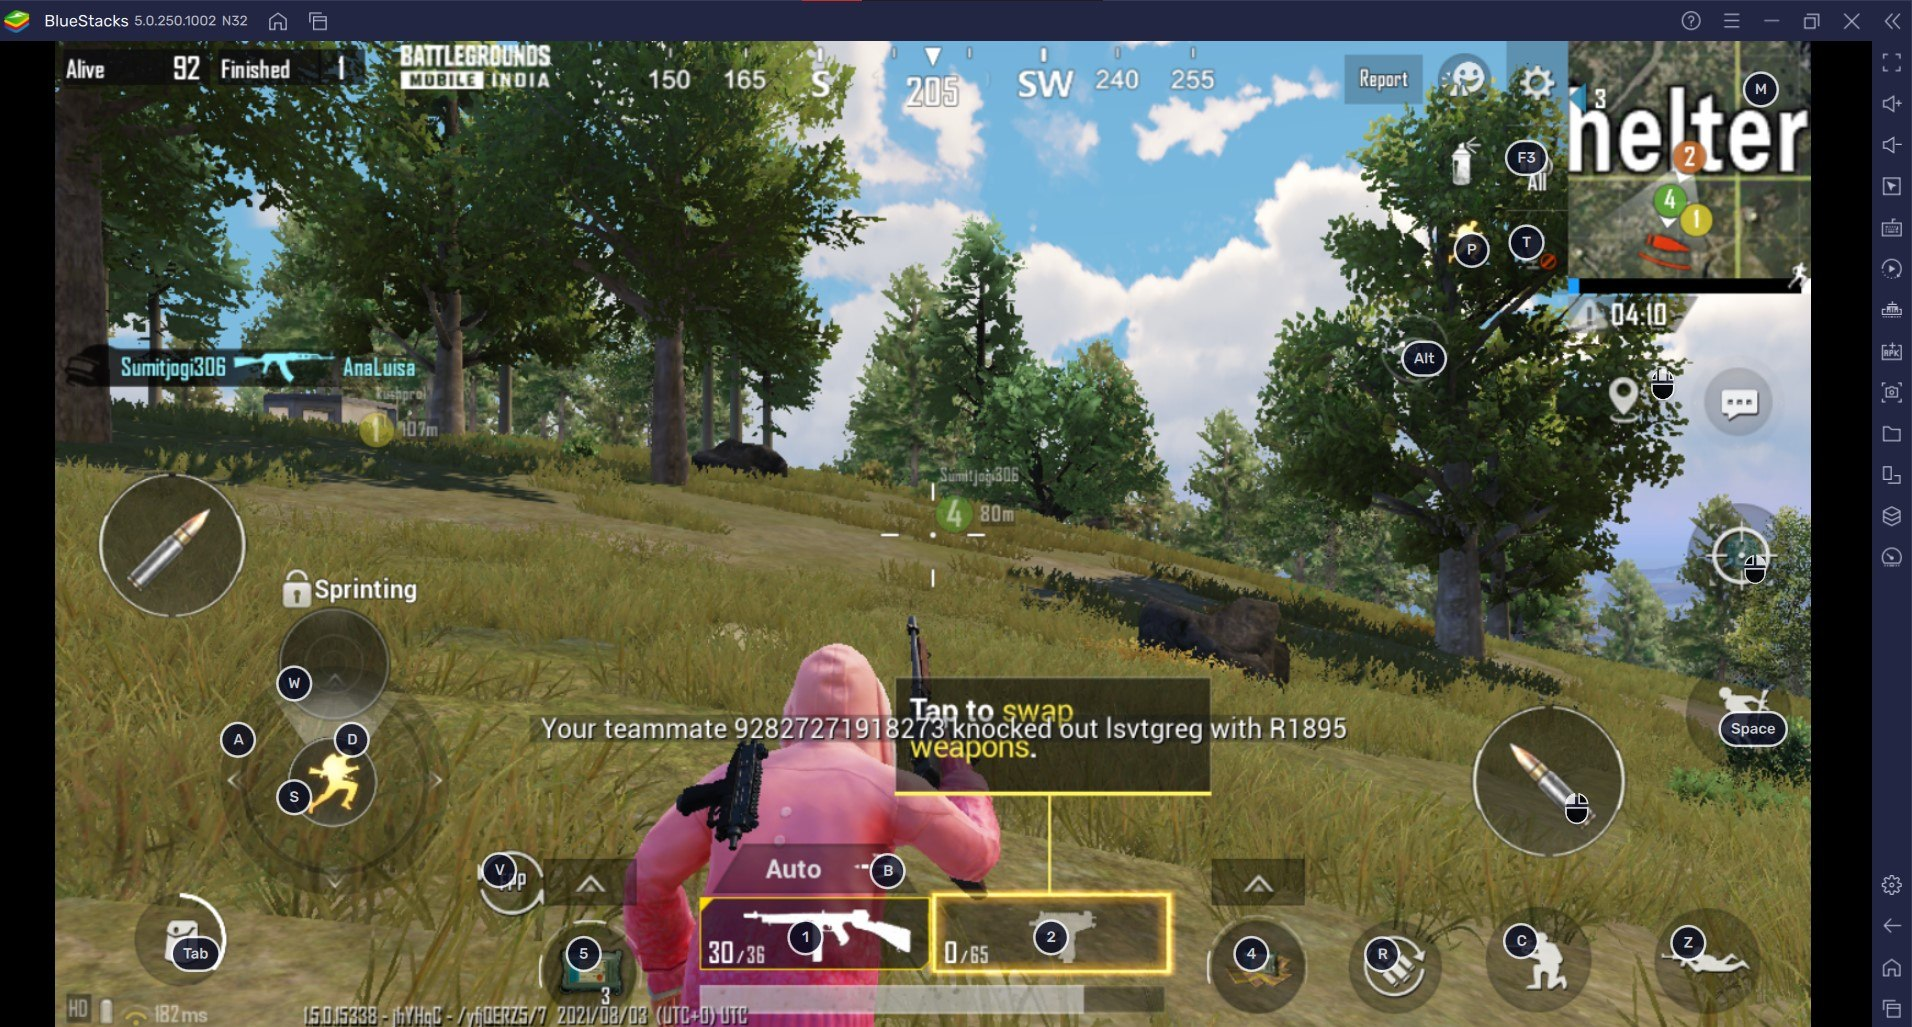 BGMI on PC: BlueStacks List of Best Guns in Battlegrounds Mobile India